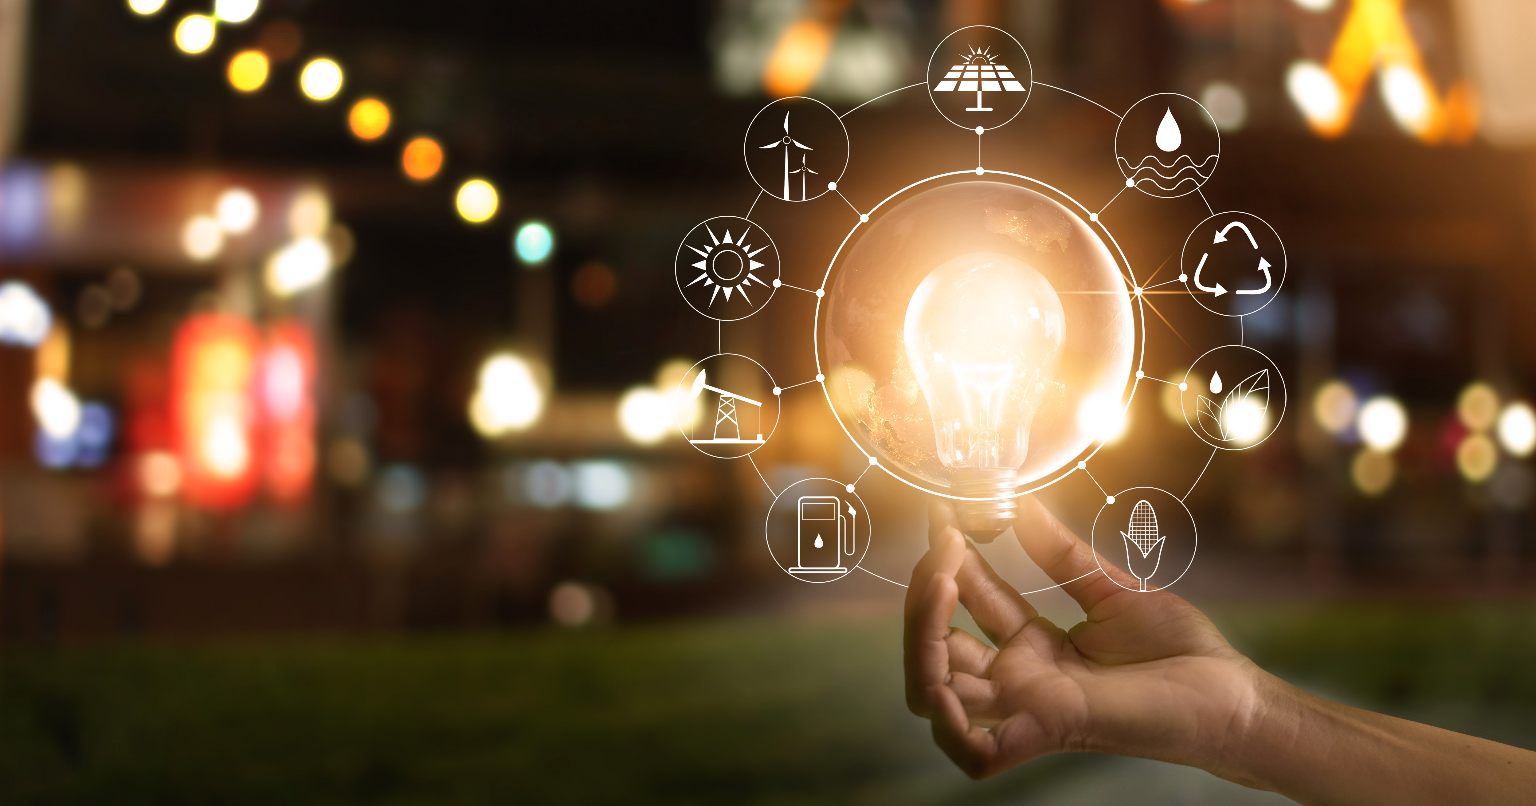 stock image of hand holding light bulb